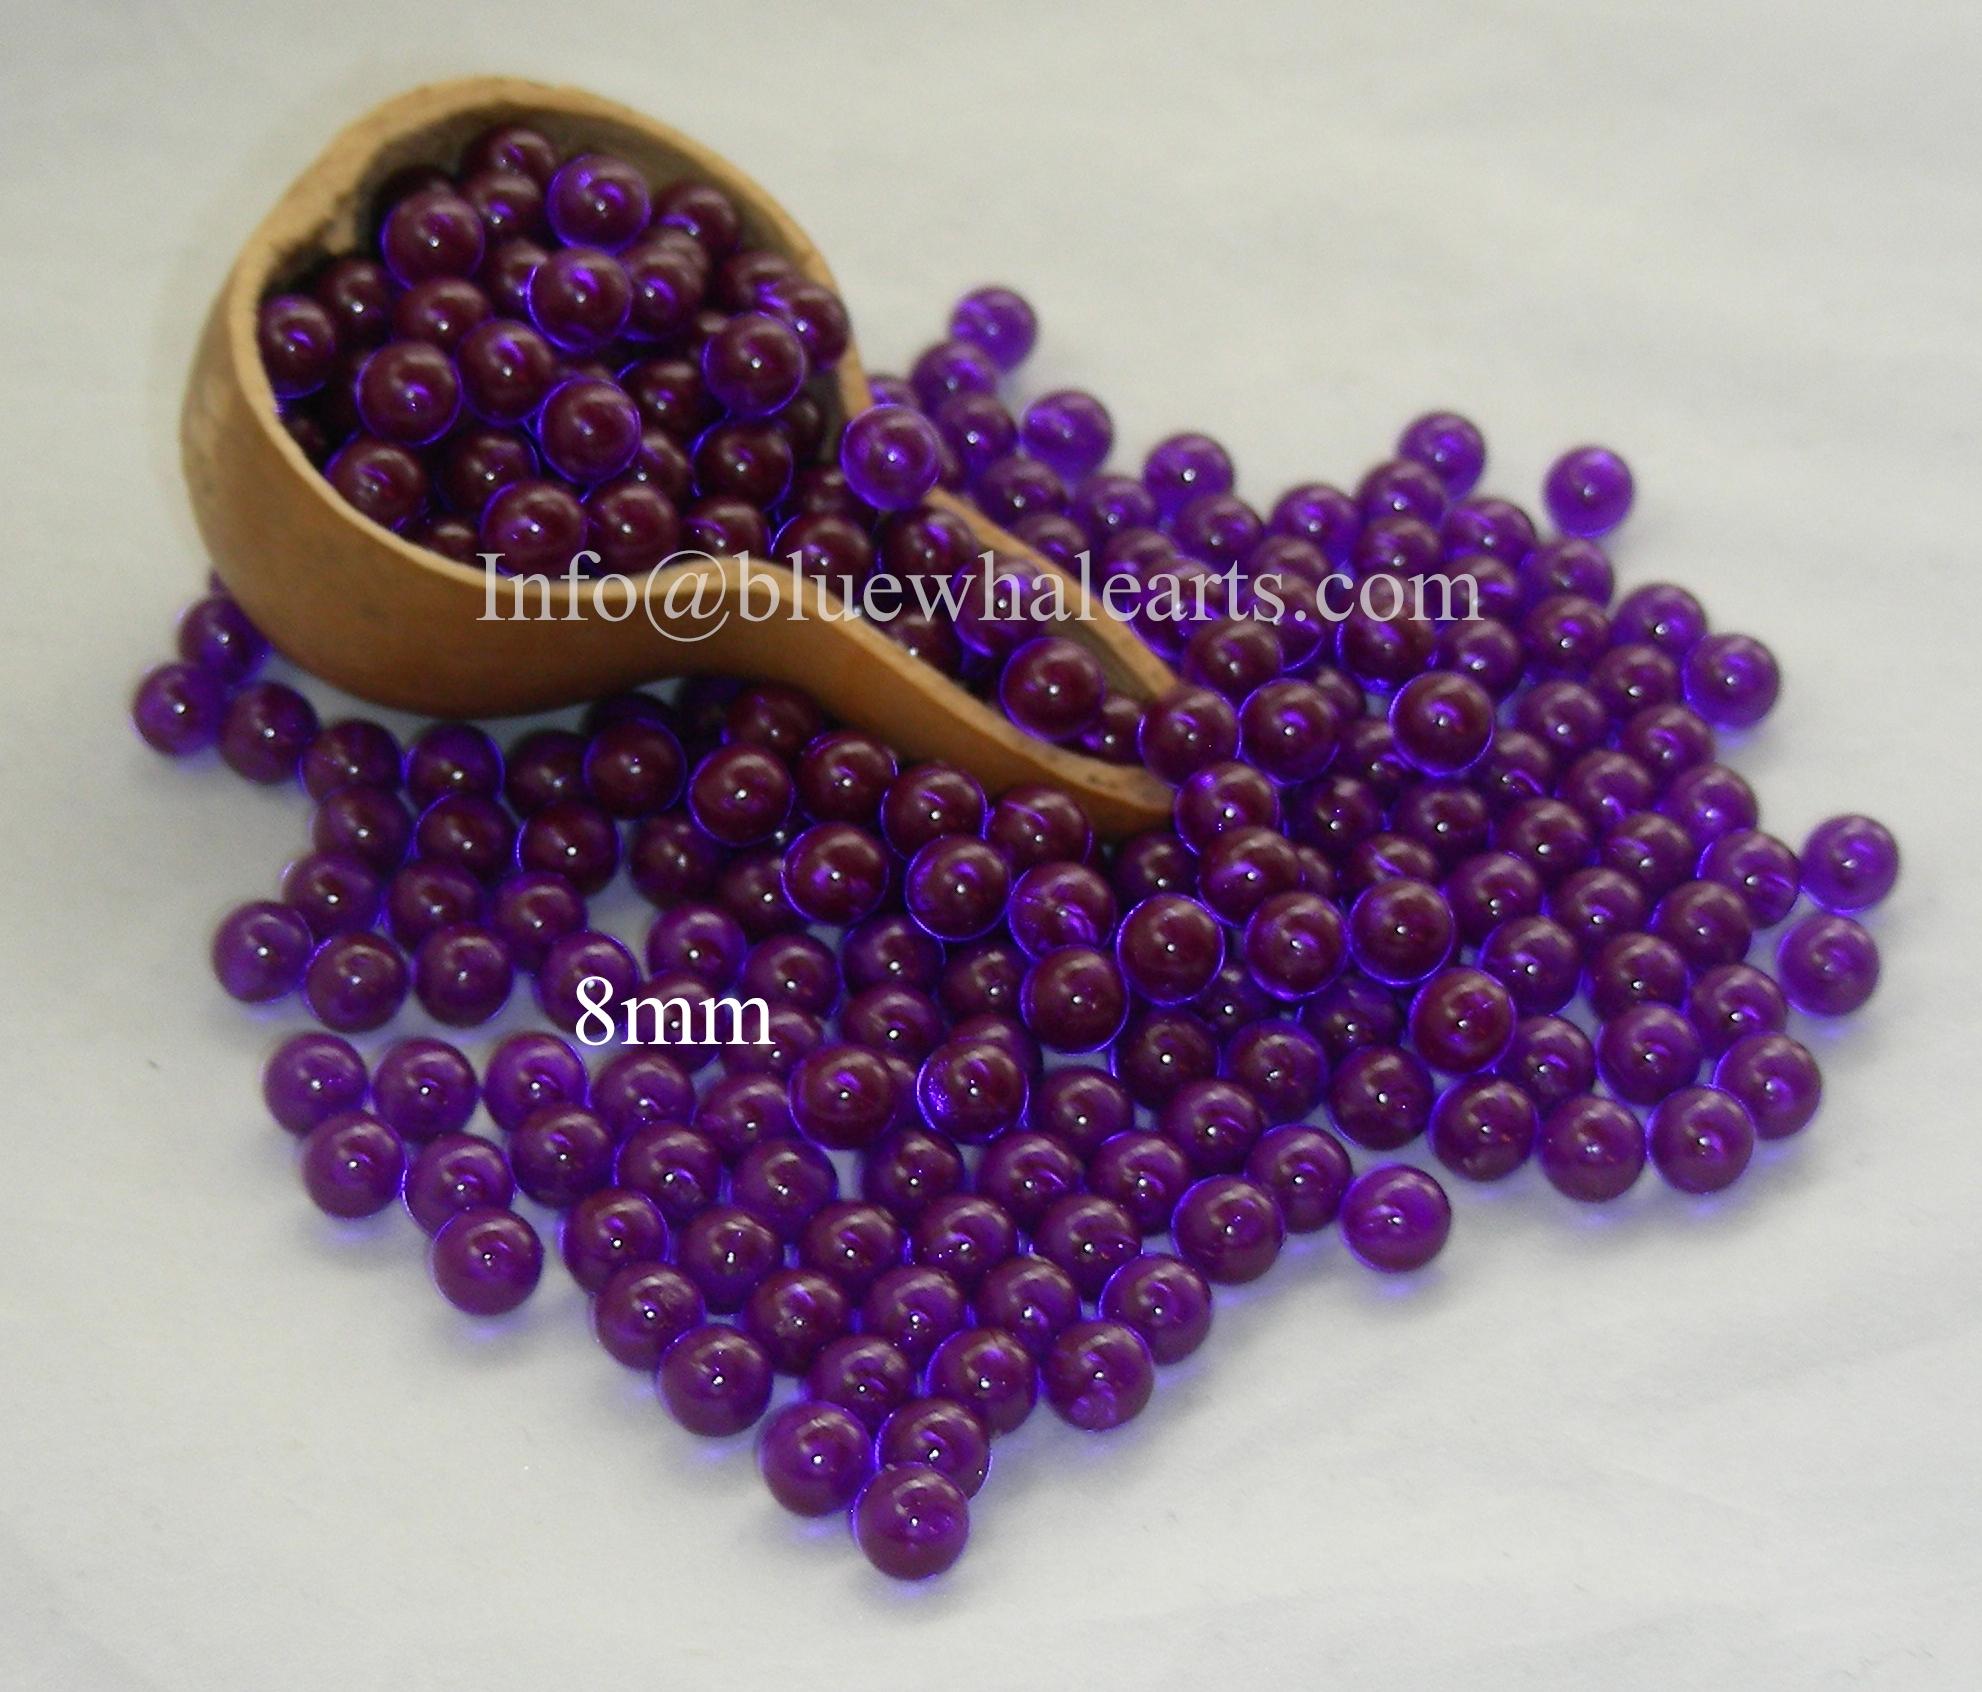 Gourd Light Beads from Turkey Egg Plant Rukish Beads